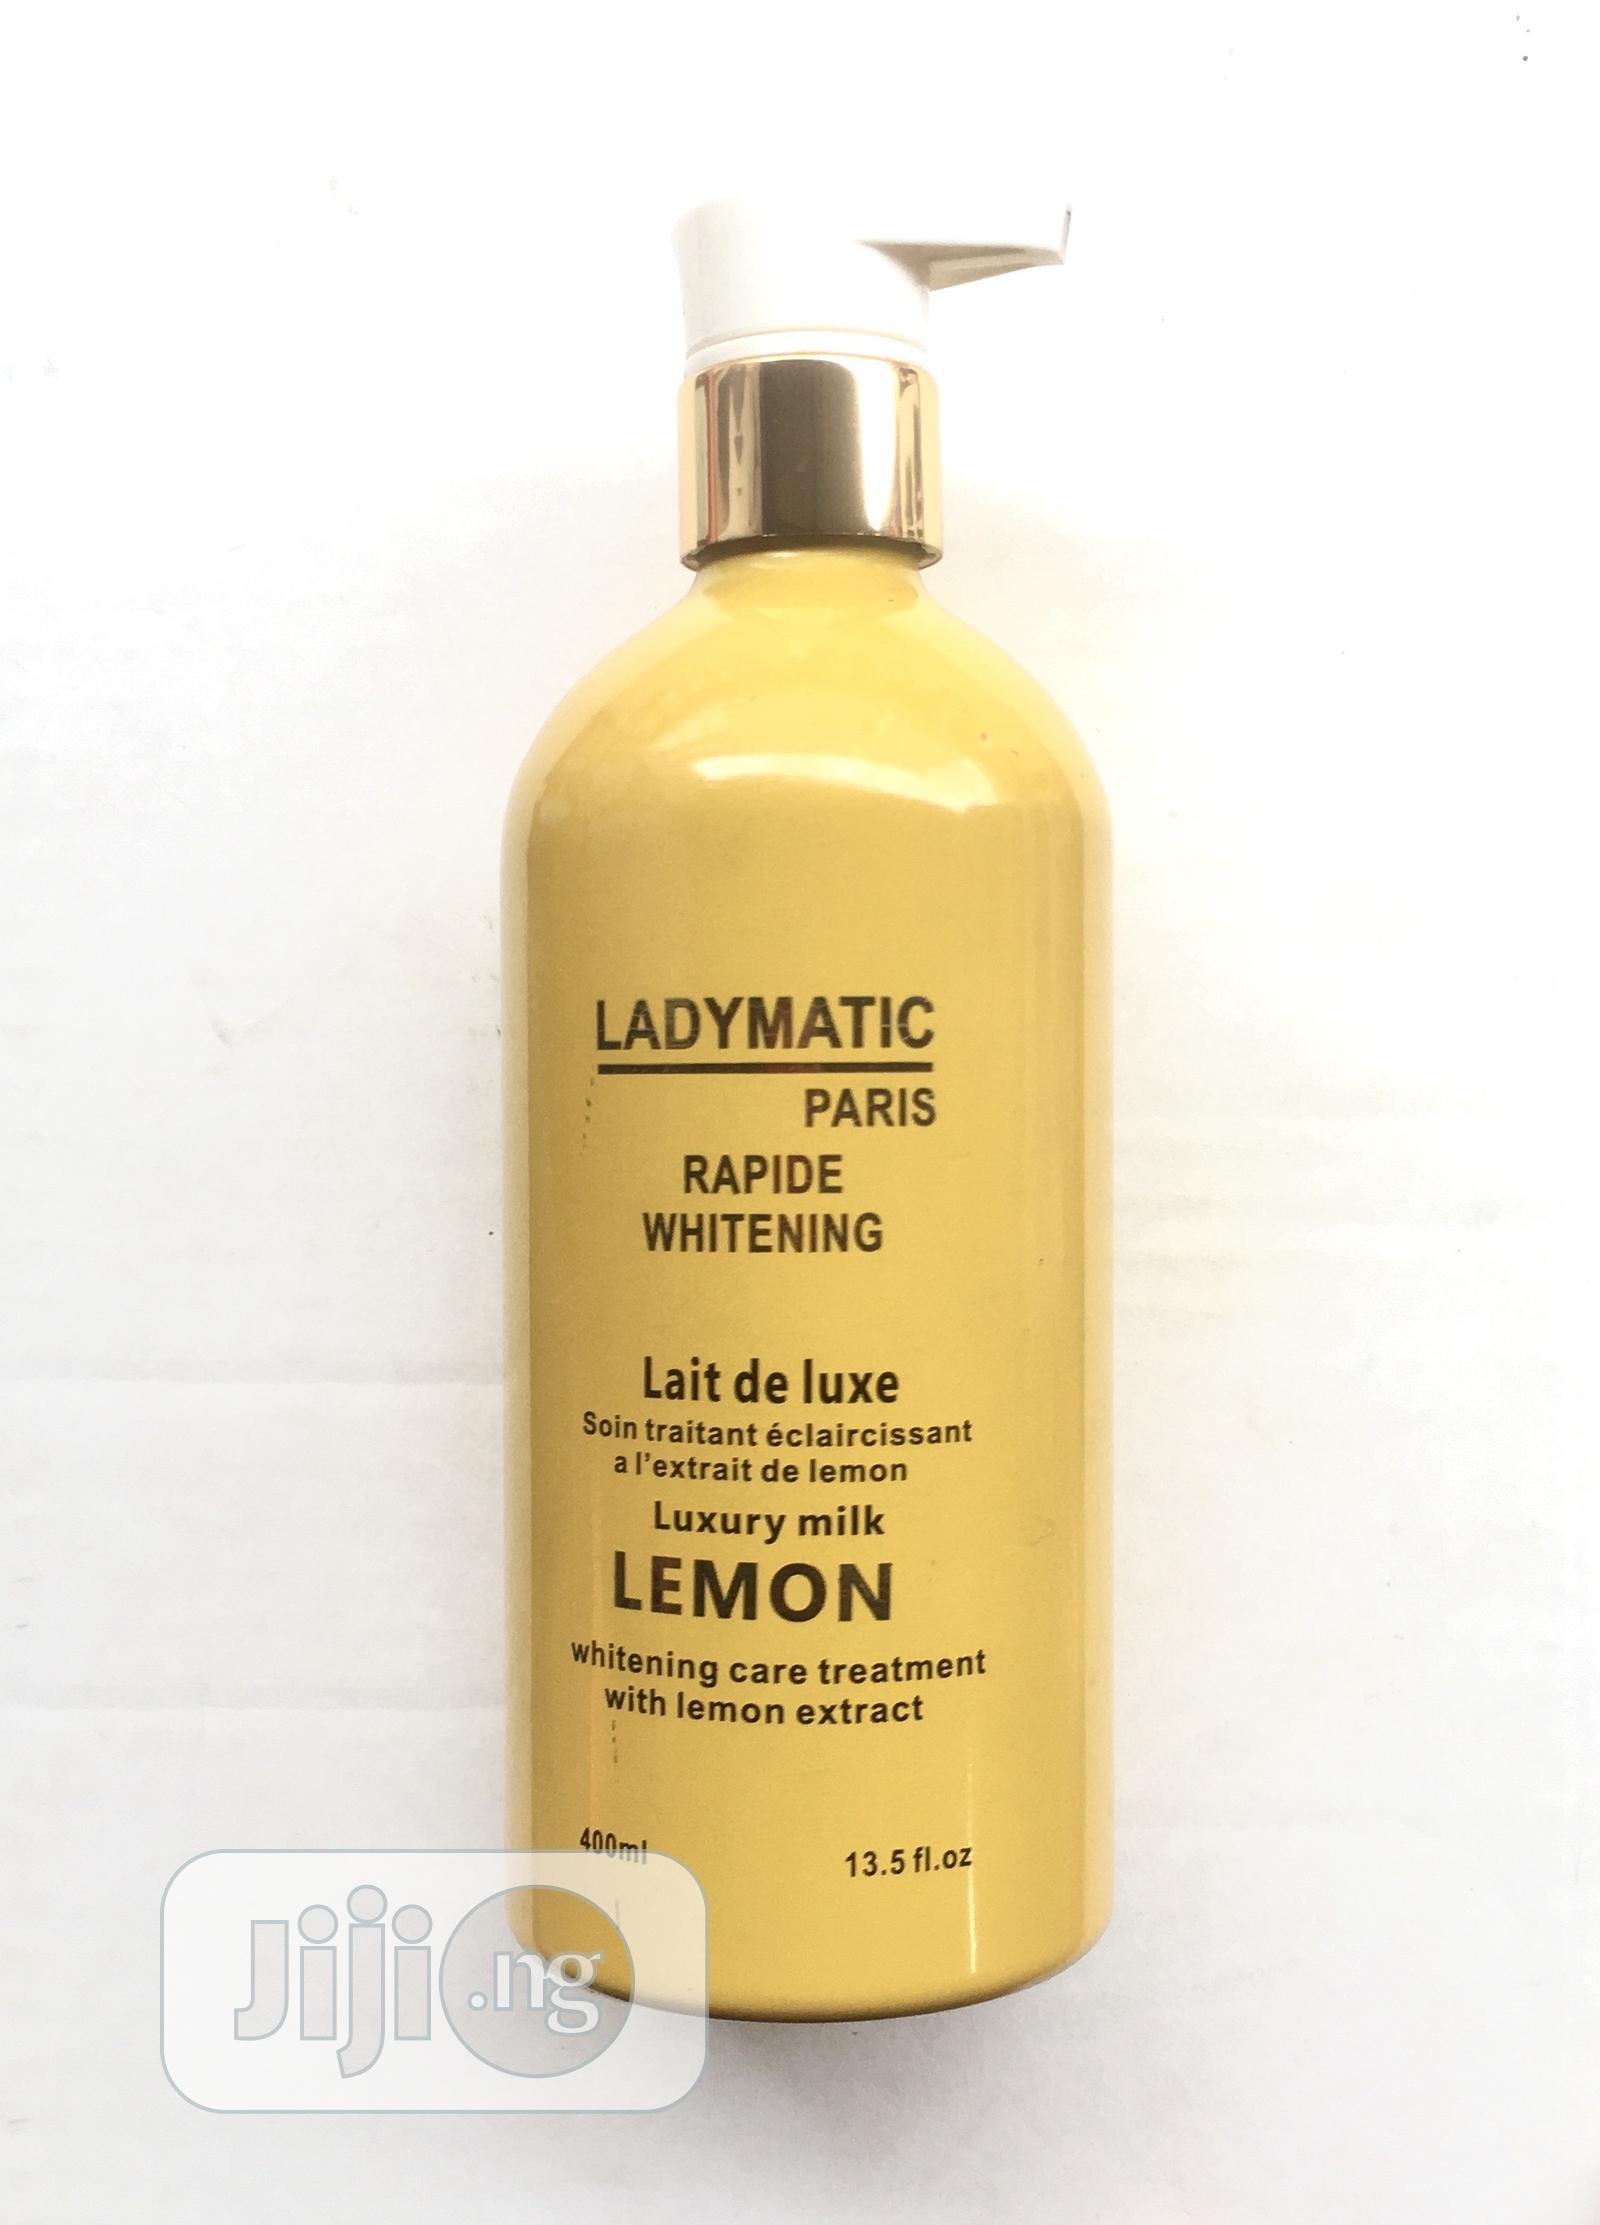 Ladymatic Rapide Whitening Cream